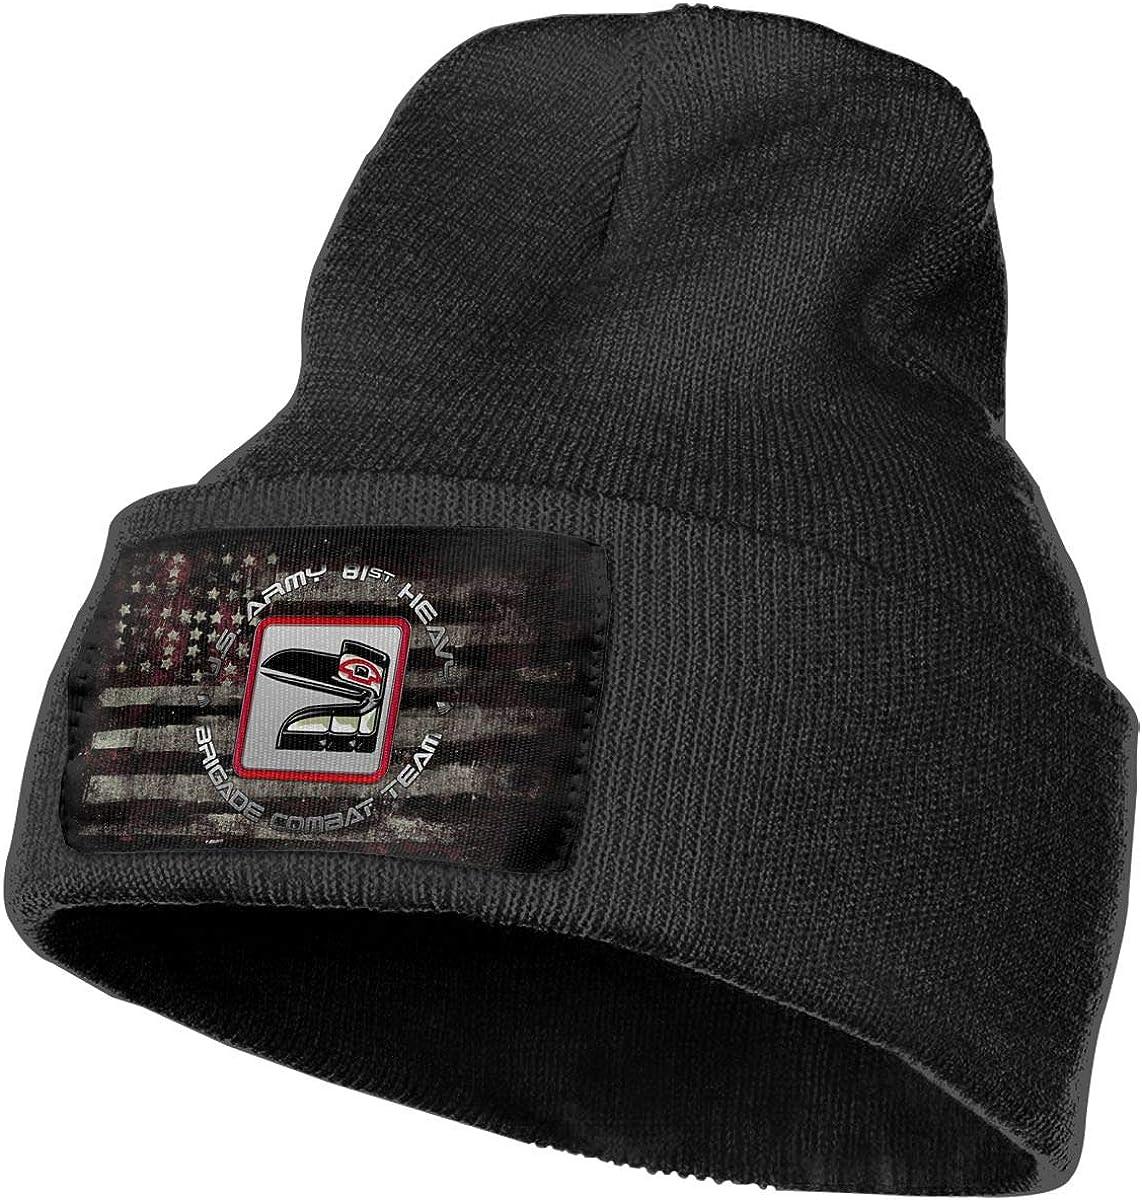 81st Infantry Brigade SSI Mens Beanie Cap Skull Cap Winter Warm Knitting Hats.